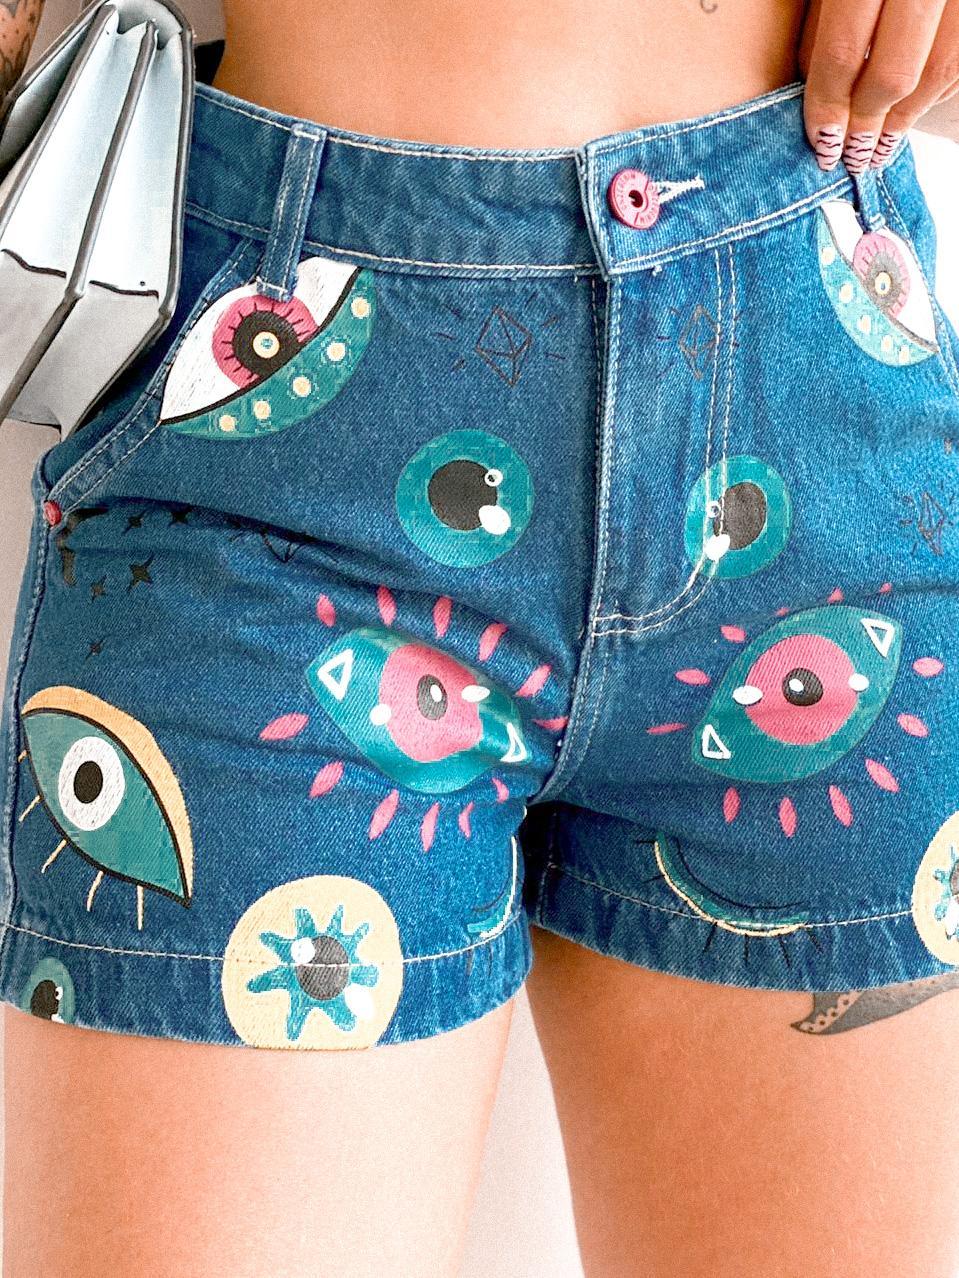 Short ART jeans